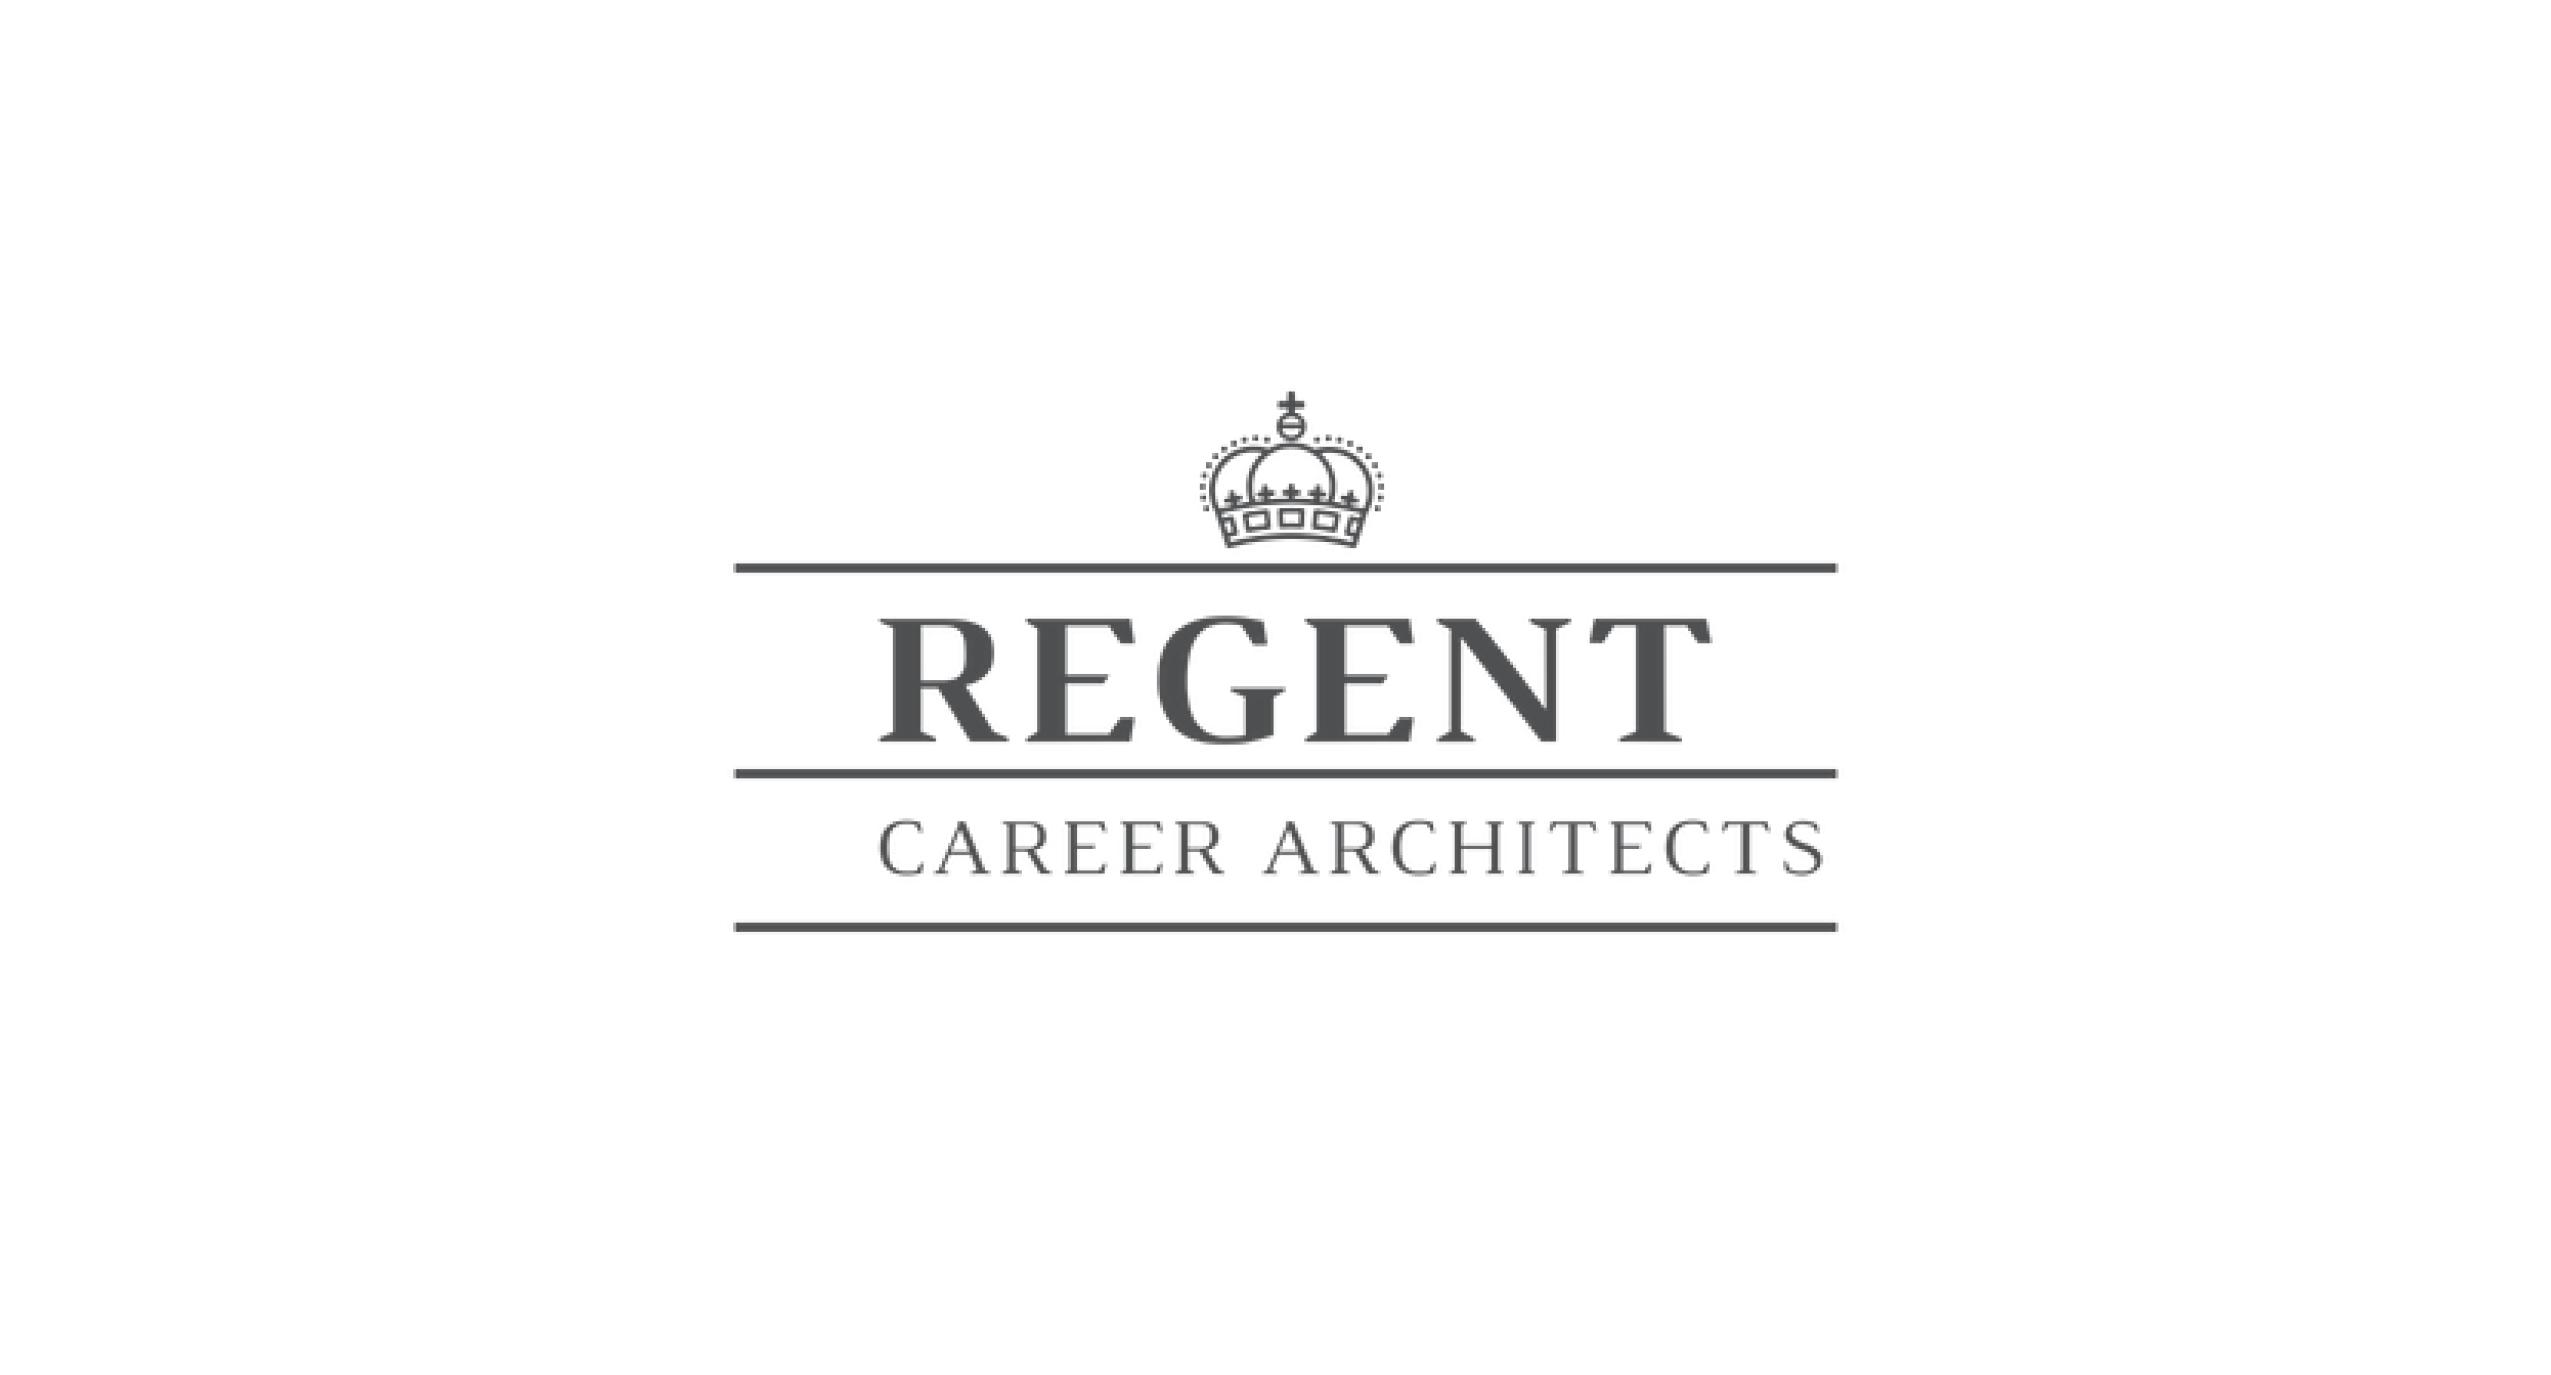 Regent Career Architects